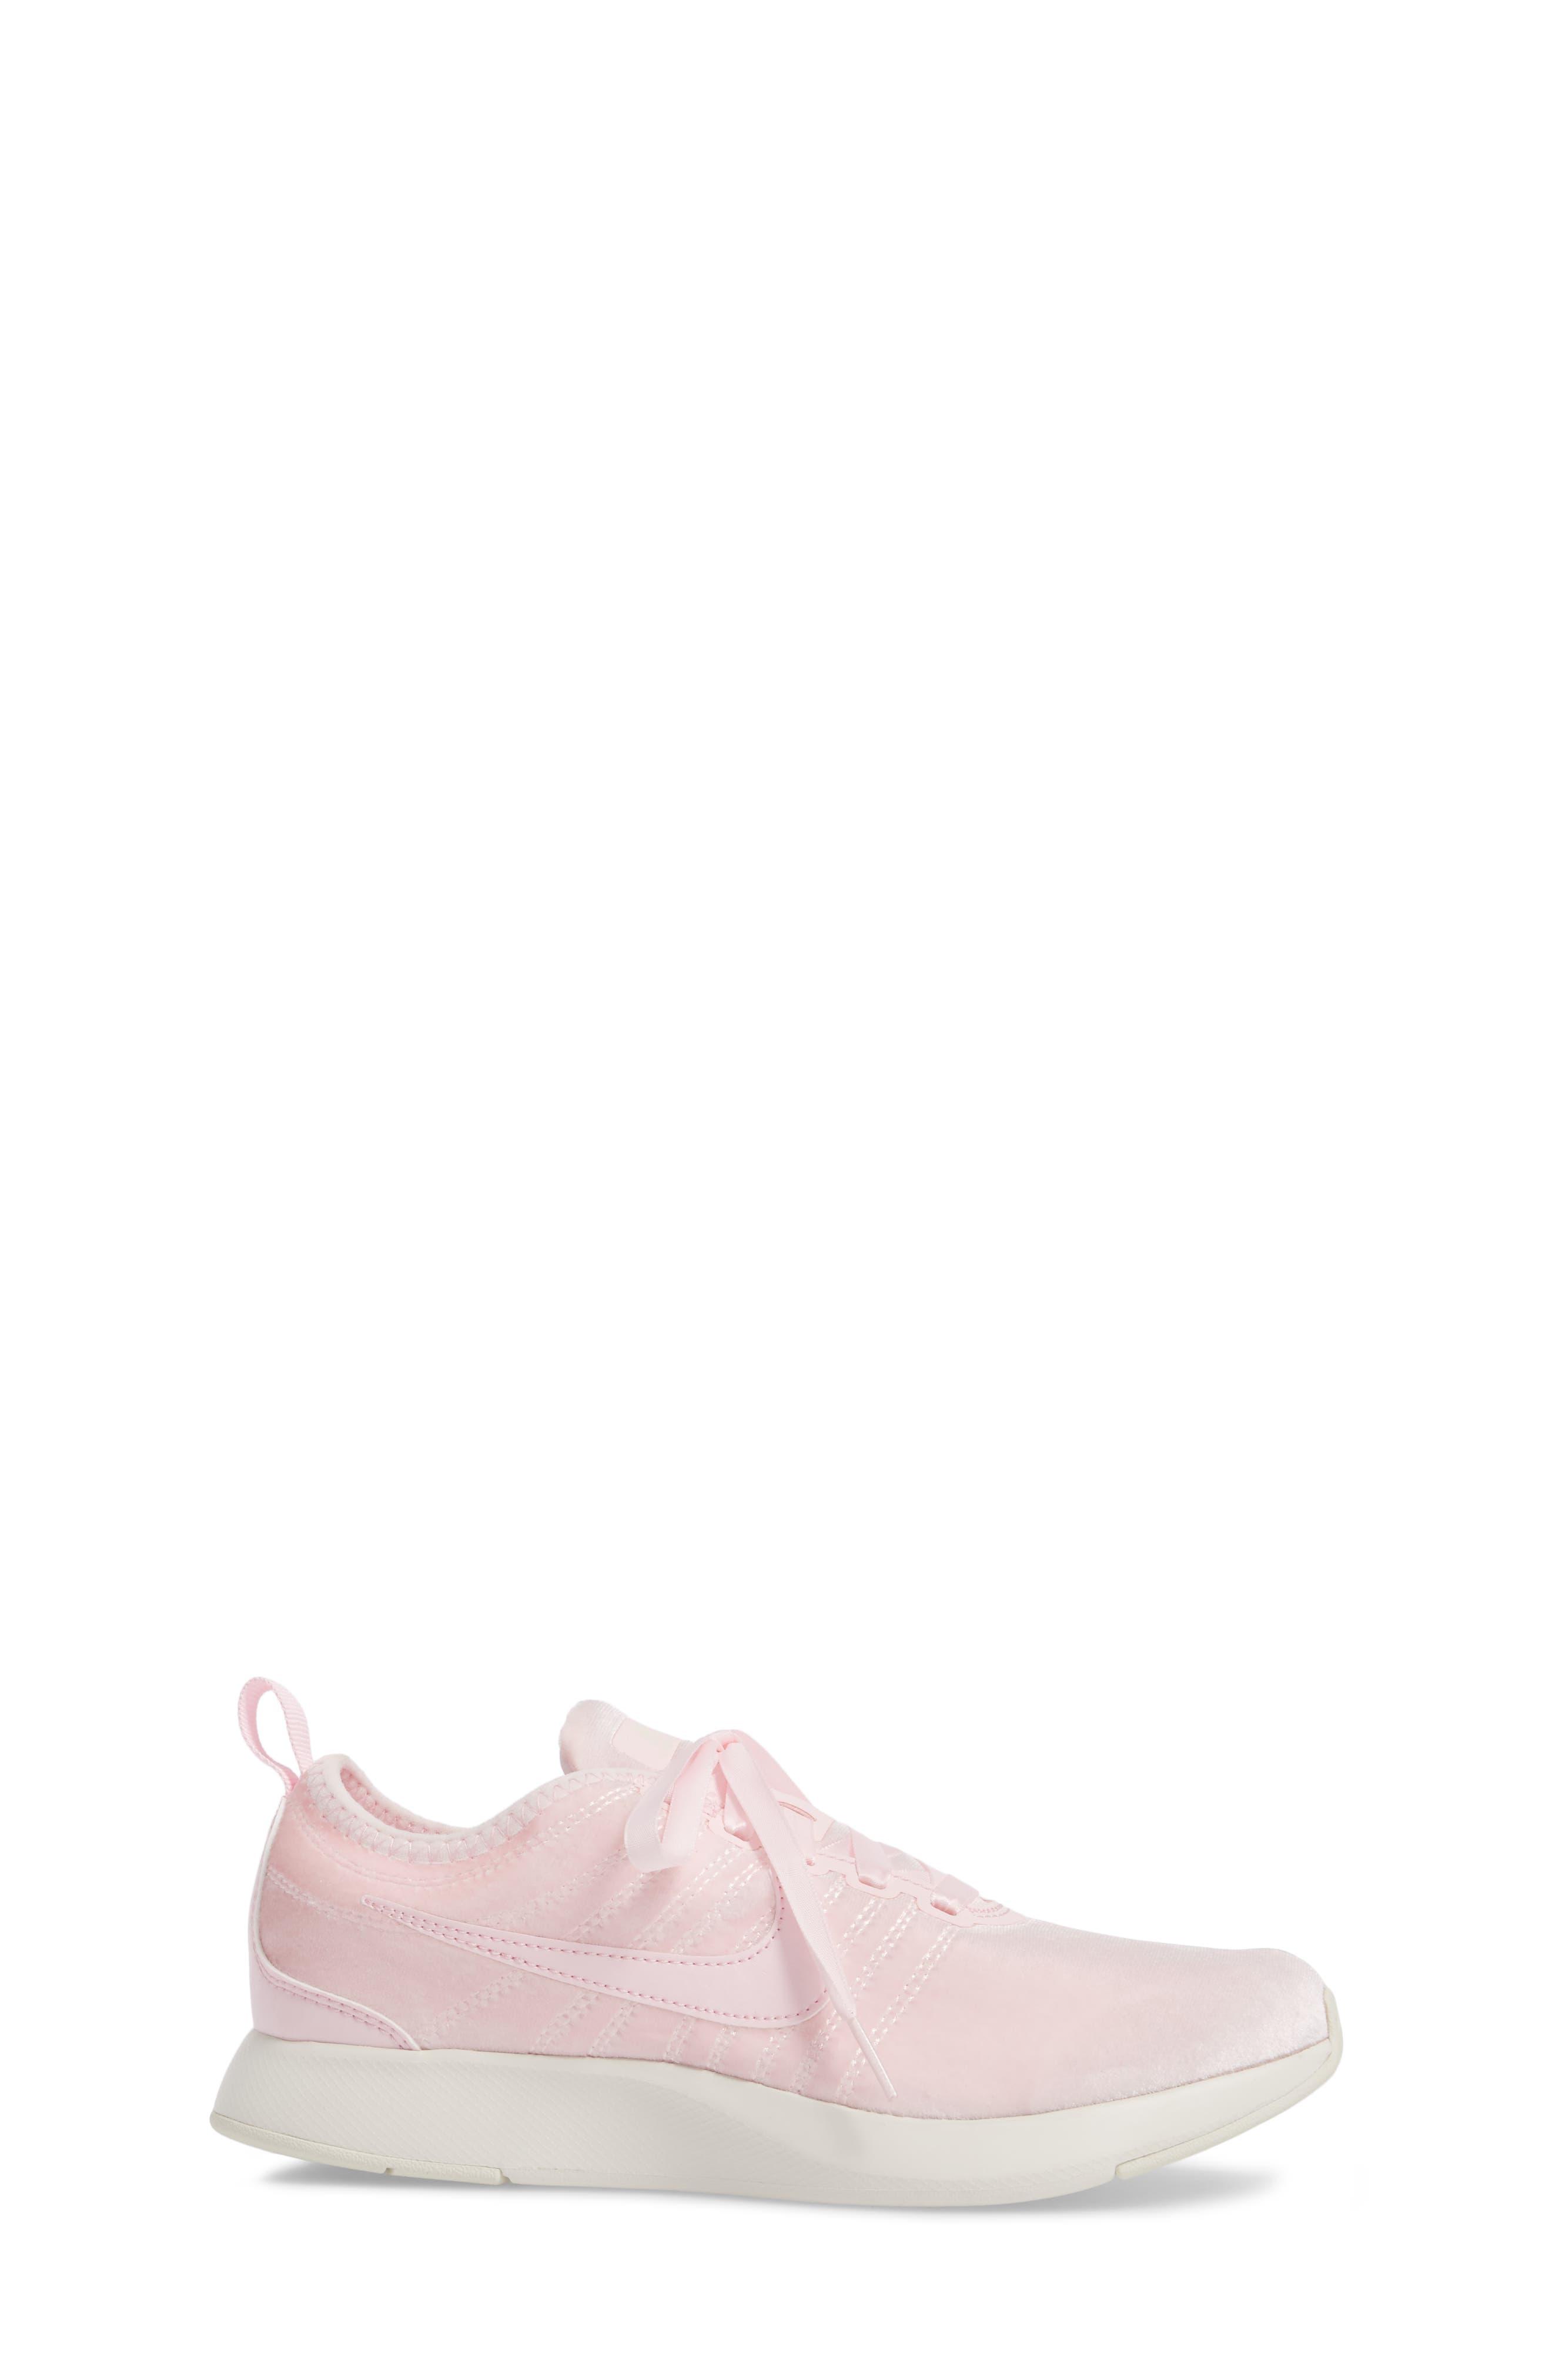 Dualtone Racer SE Sneaker,                             Alternate thumbnail 3, color,                             650